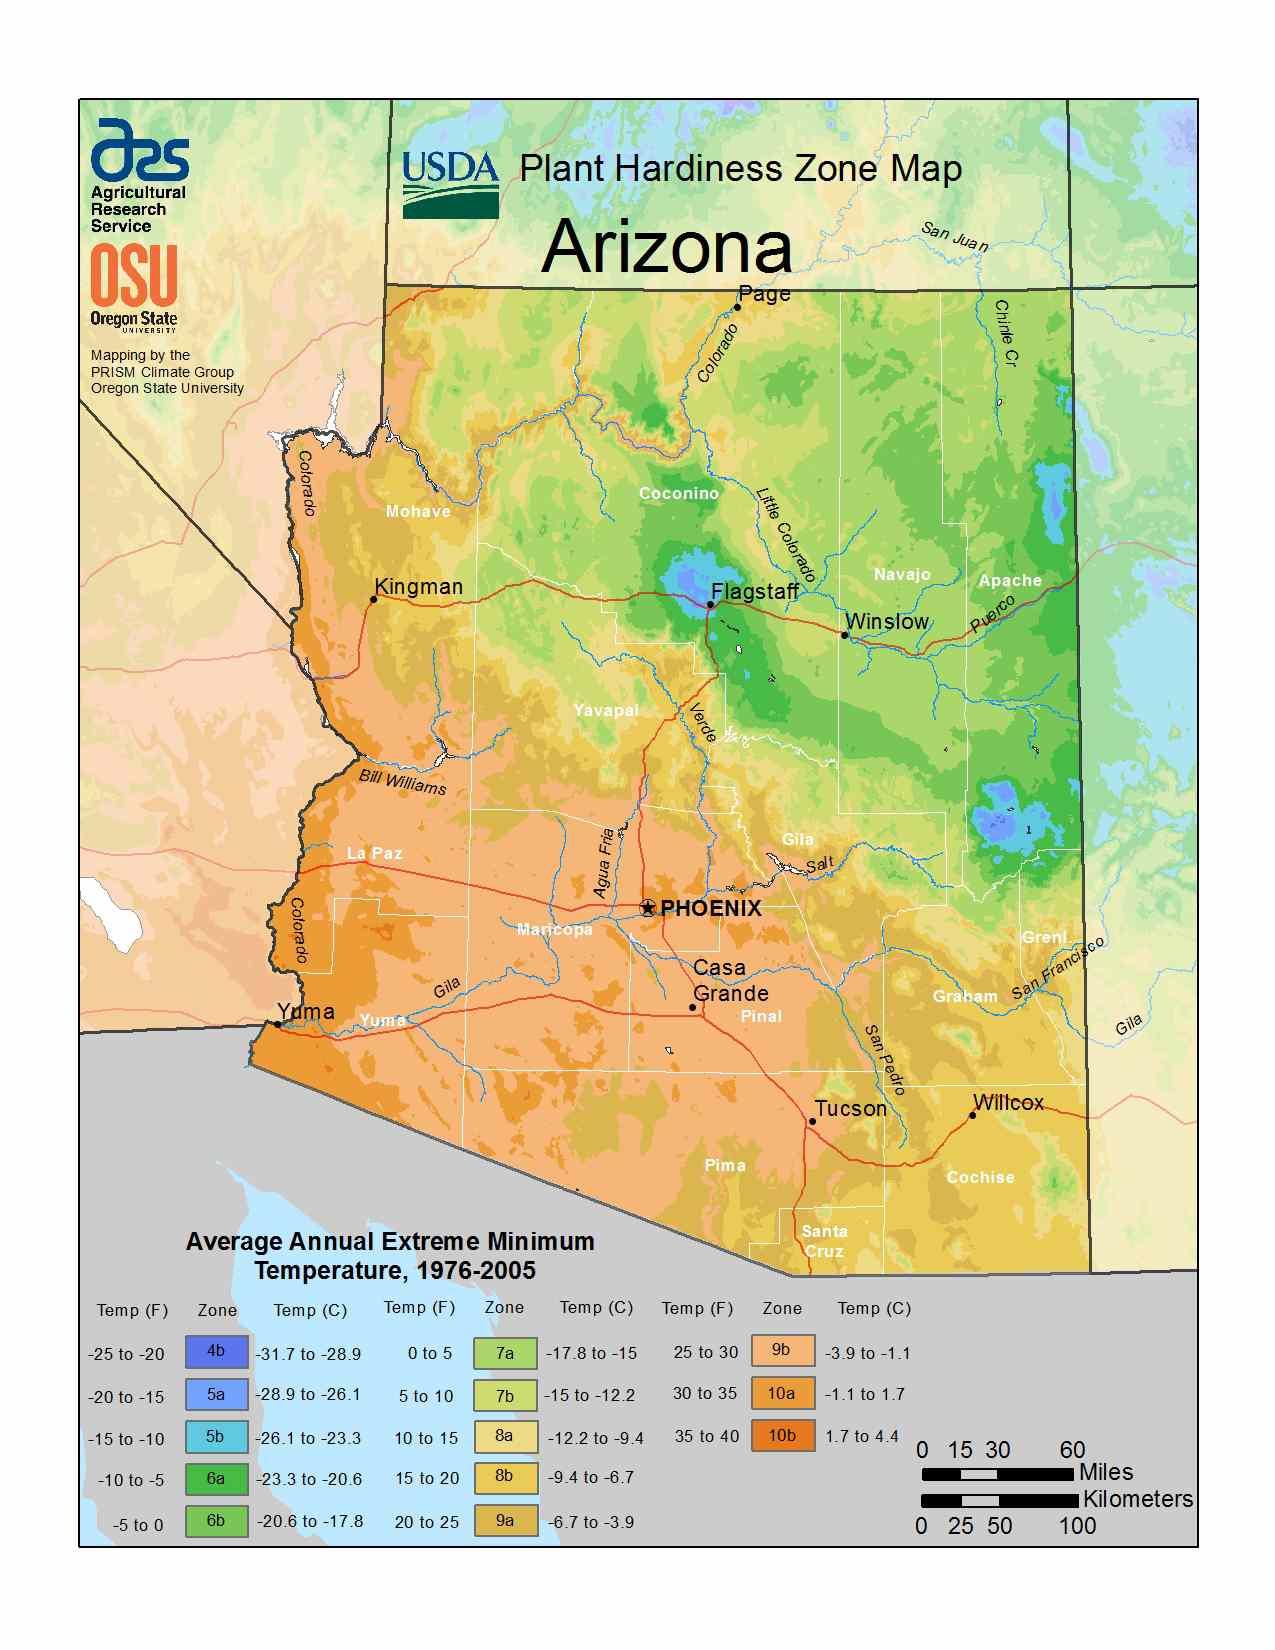 Photo of the Arizona Hardiness Zones